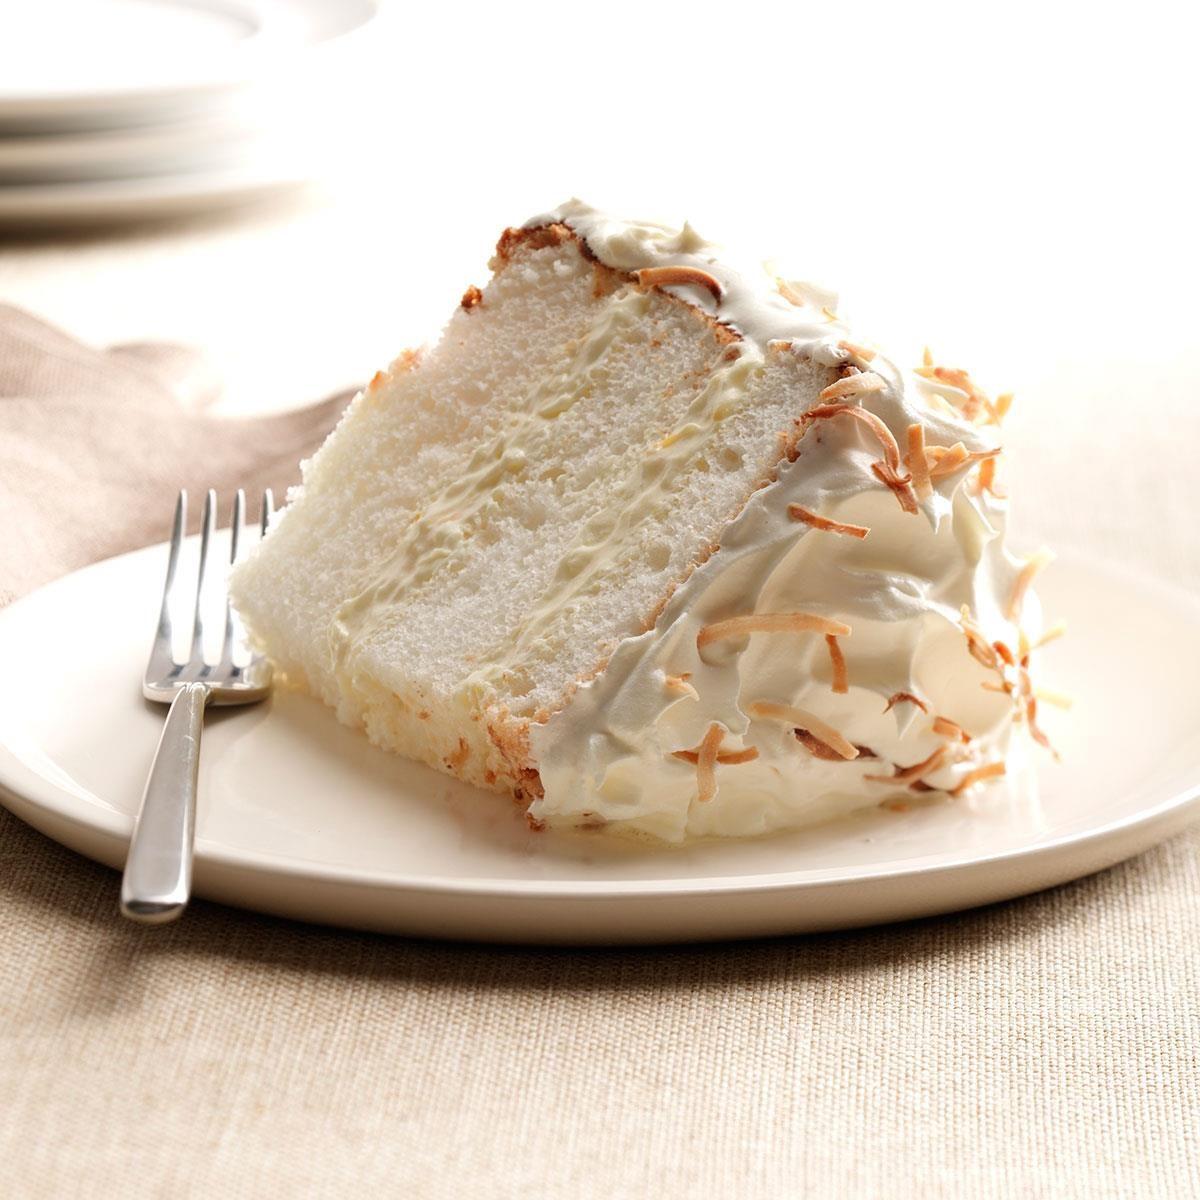 My Cake Art Elizabethton Tn : Orange-Coconut Angel Food Cake Recipe Taste of Home